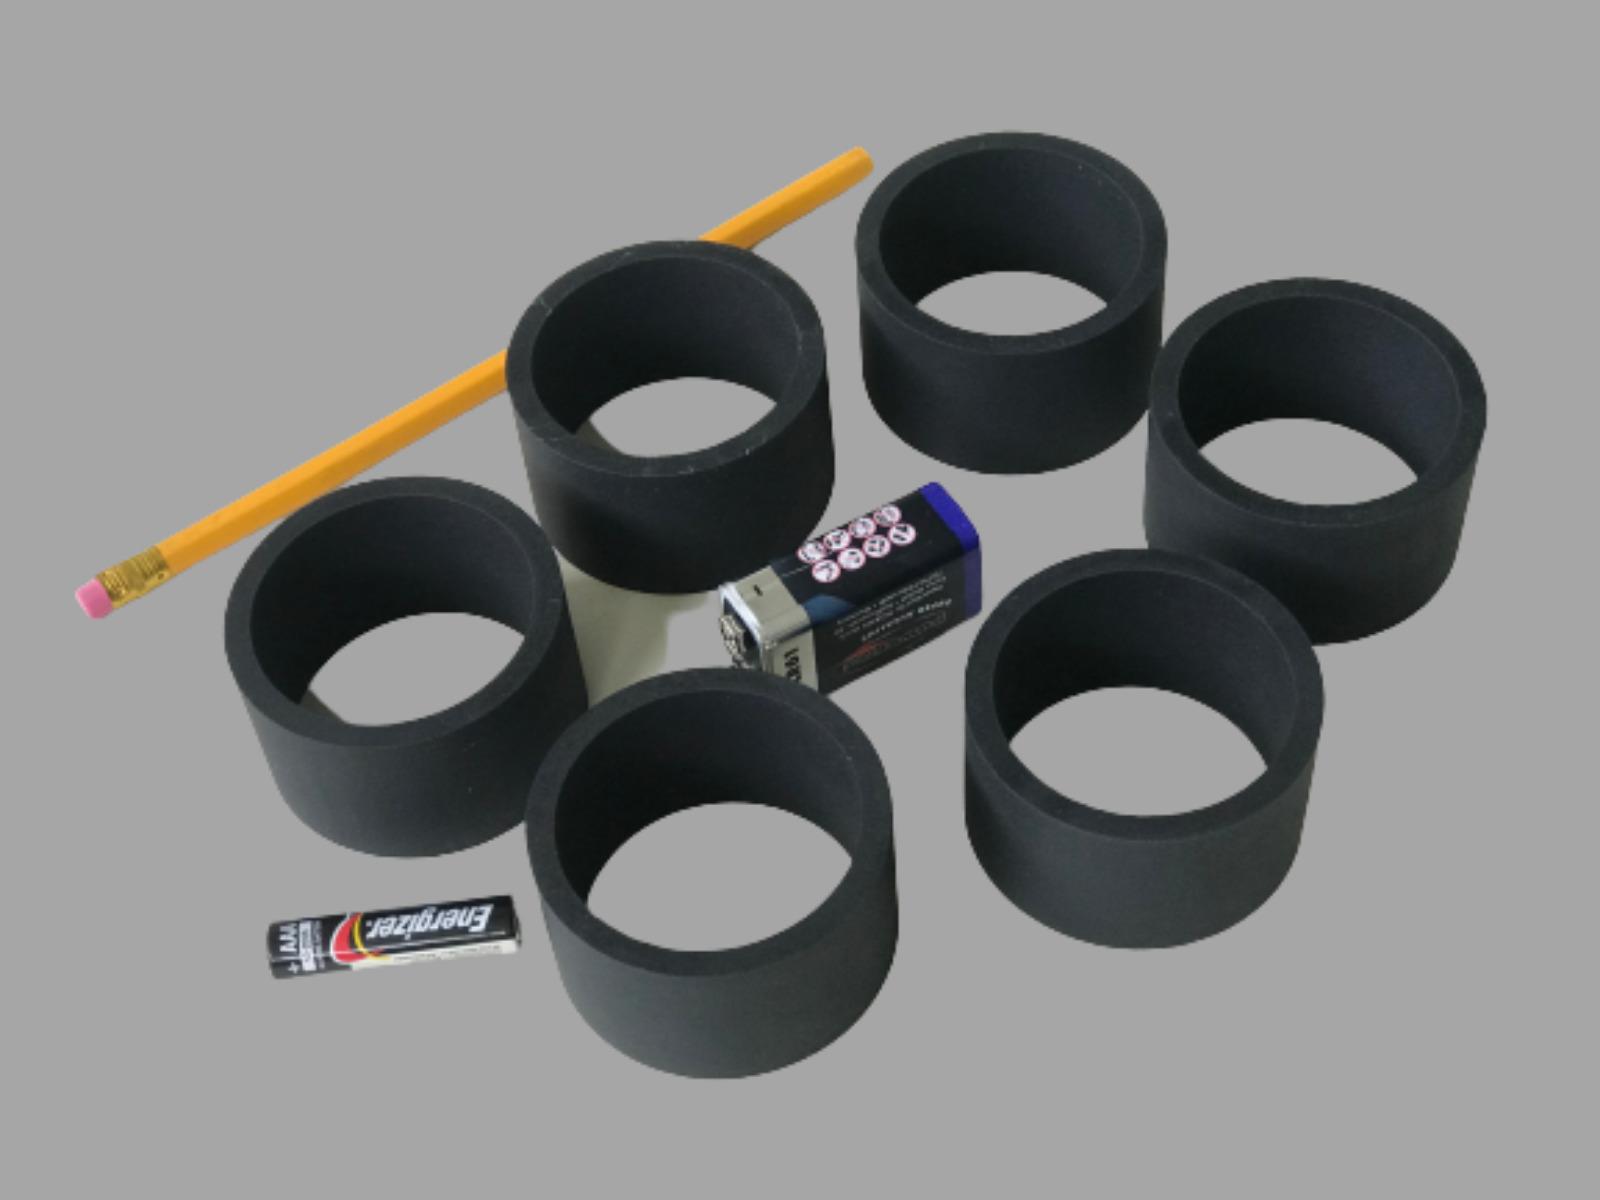 Hollow HTS cylinder targets